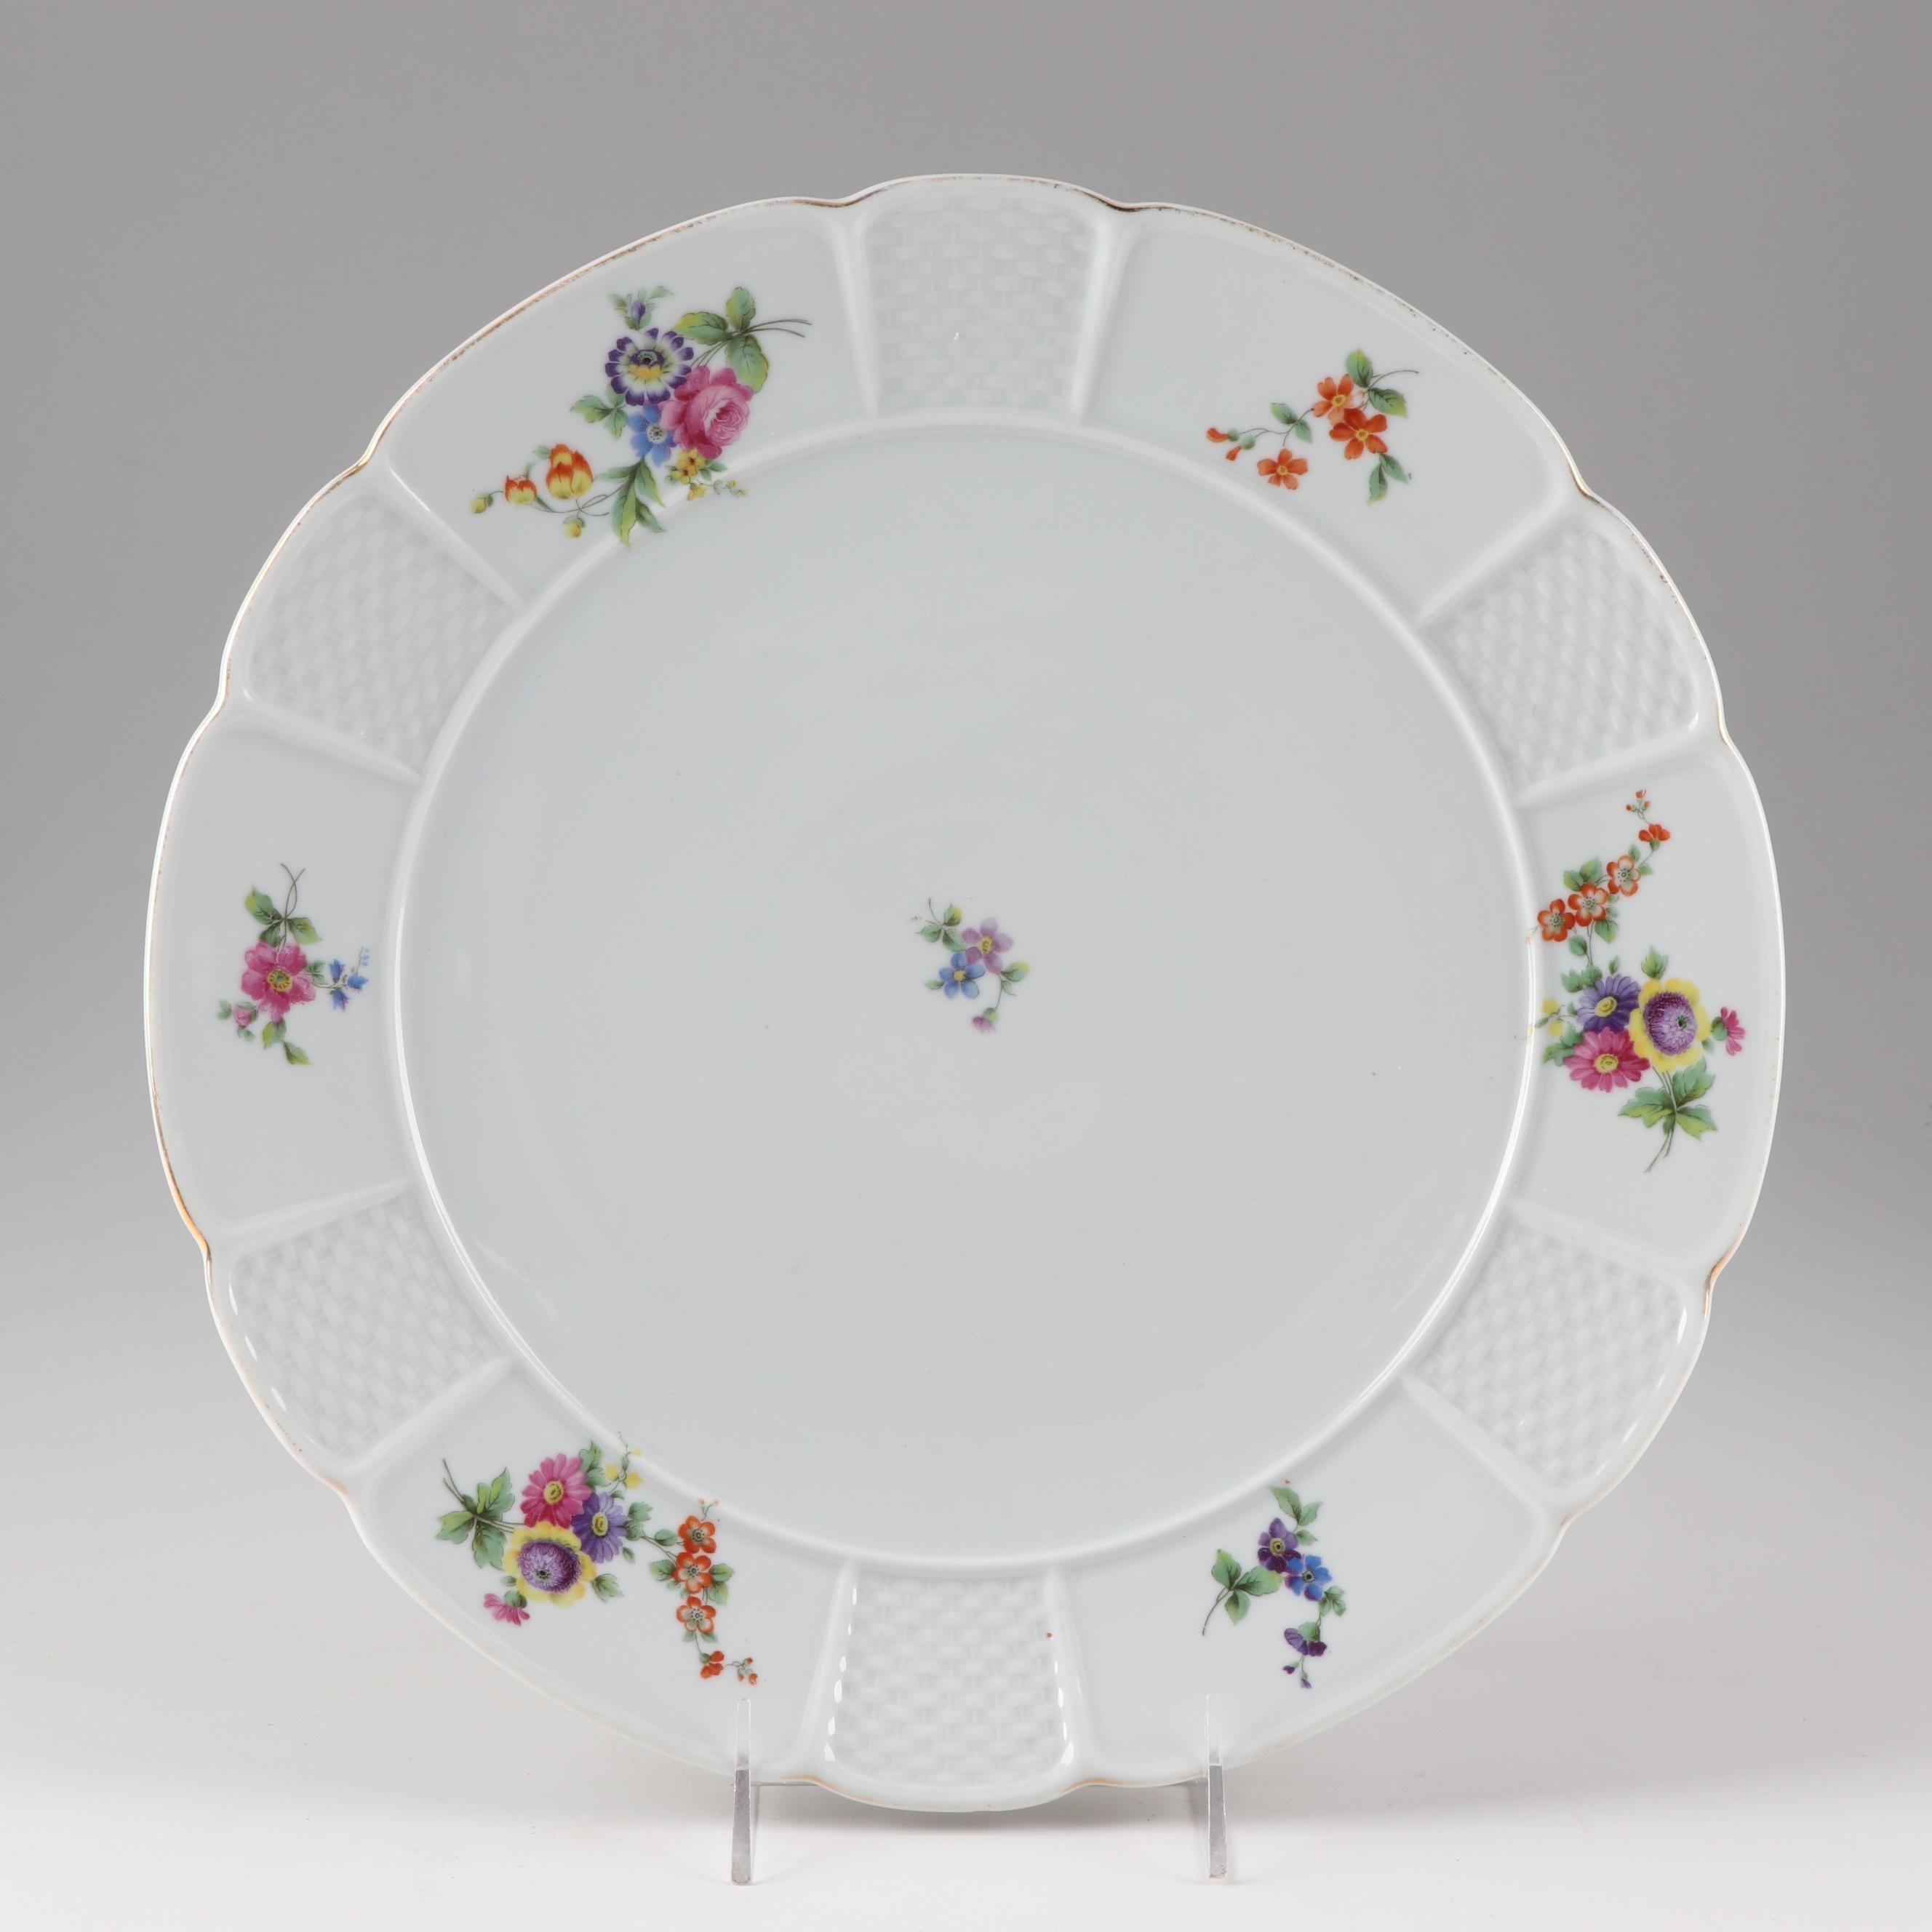 Rosenthal Cake Plate